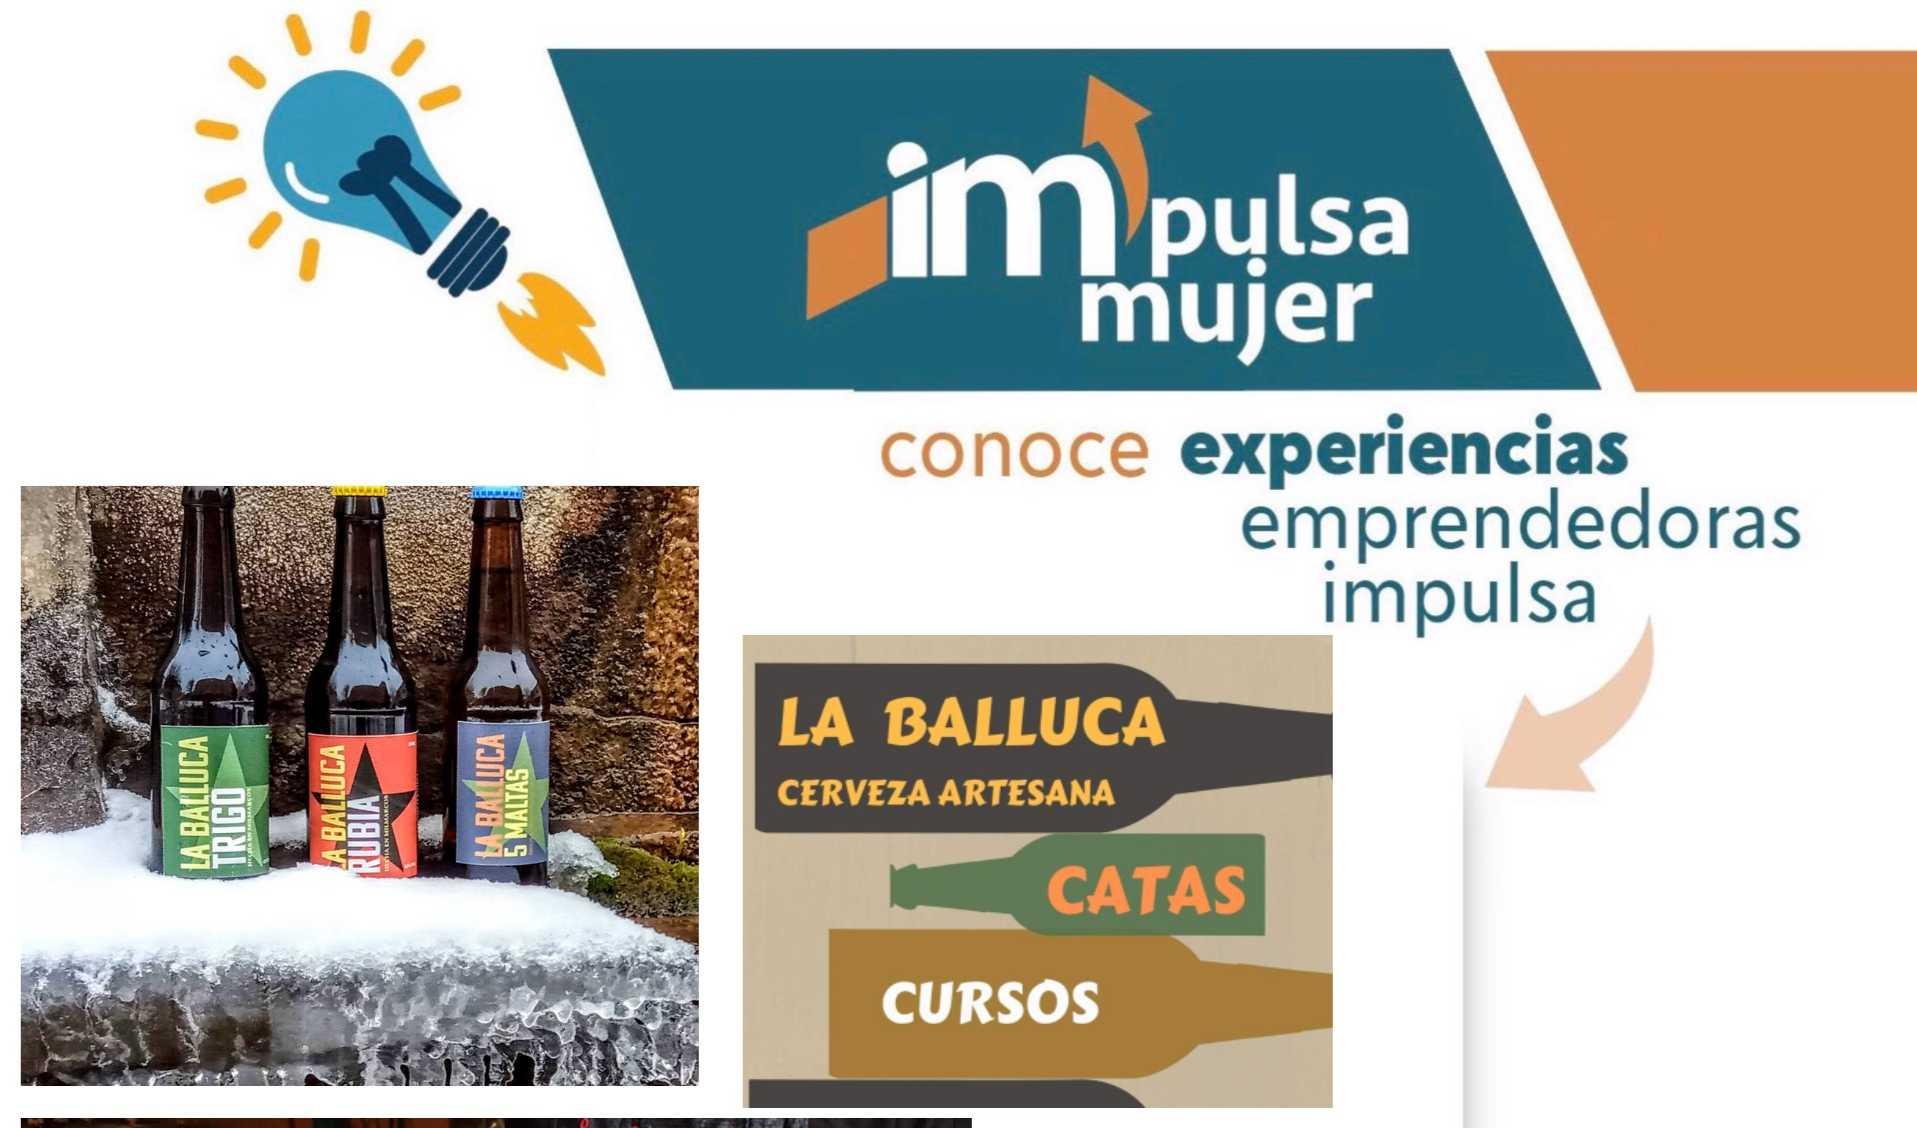 Experiencia emprendedora Judith La Balluca Cerveza Artesana.